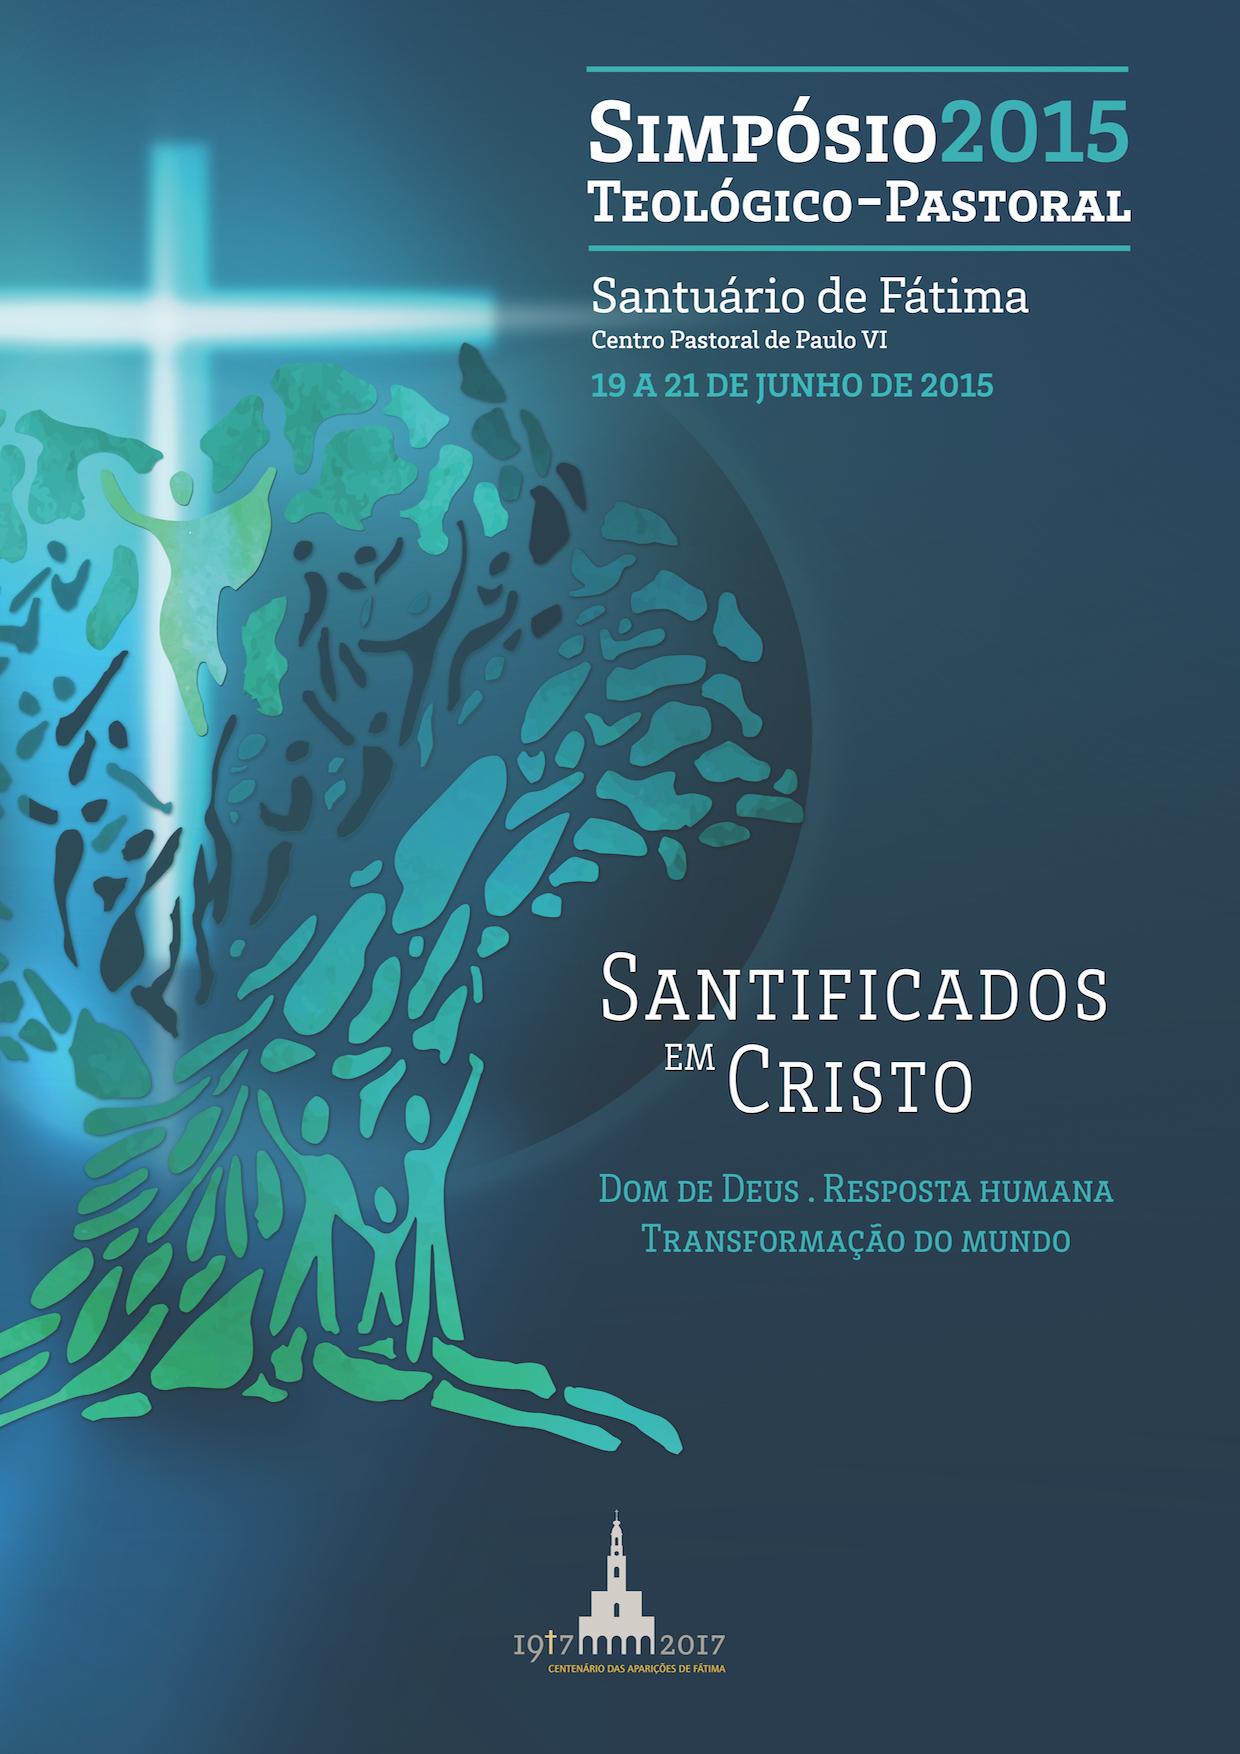 Simposio 2015 Santificados em Cristo_cartaz.jpg